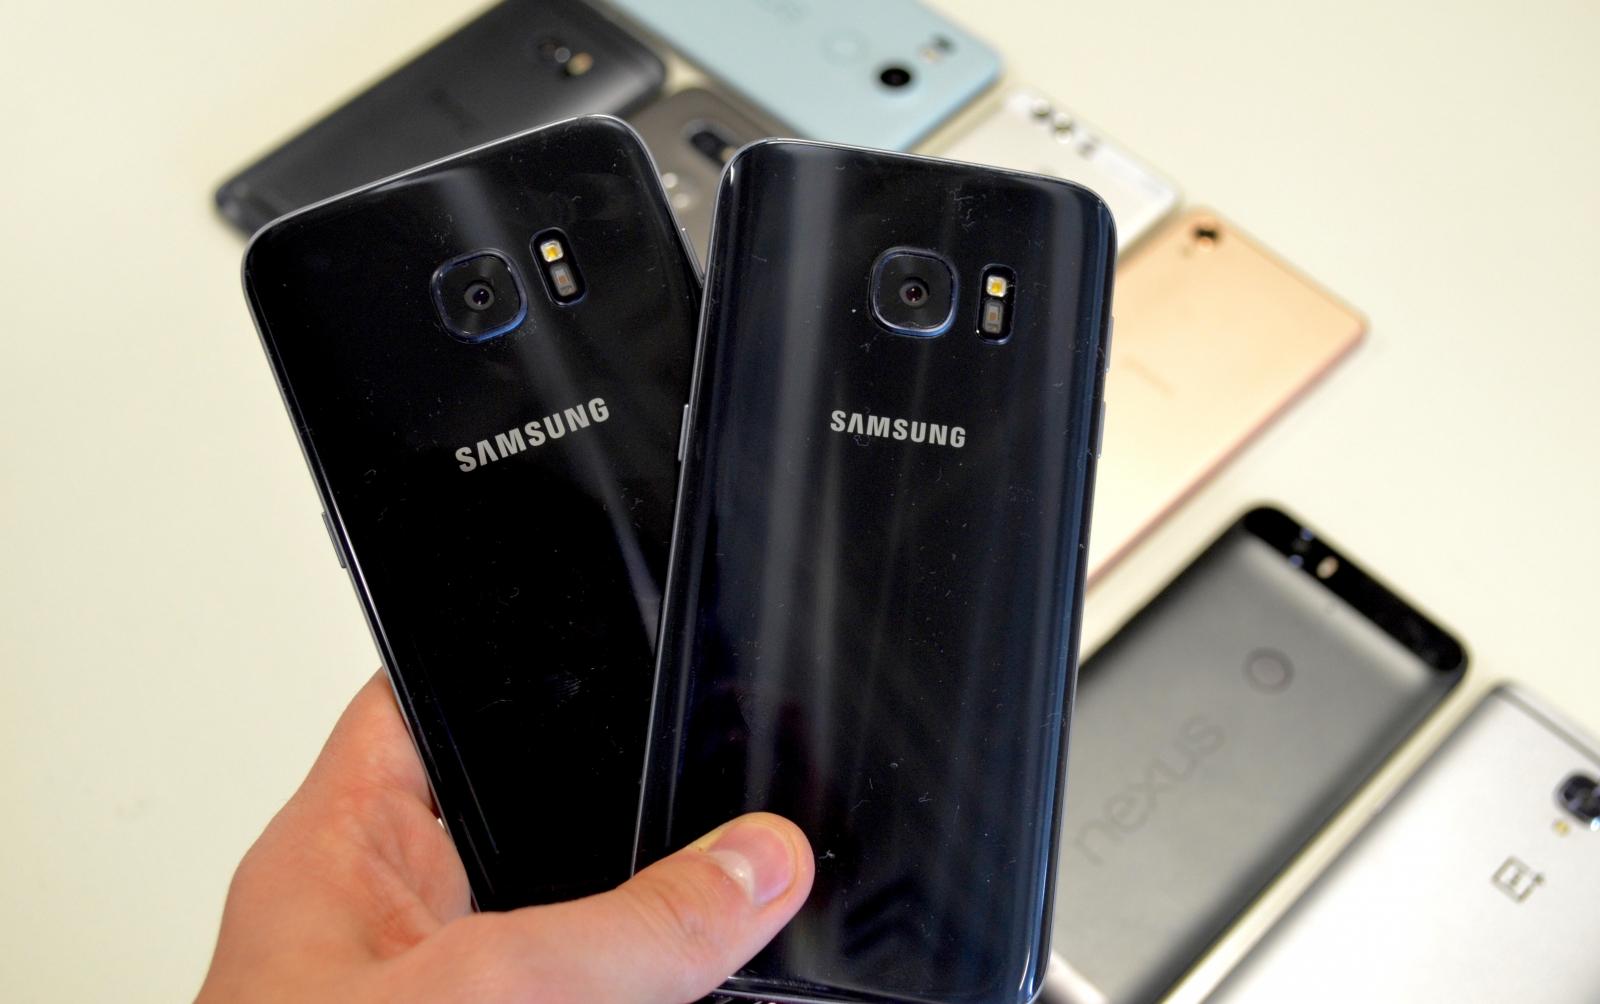 Samsung Galaxy S7 and Galaxy S7 Edge